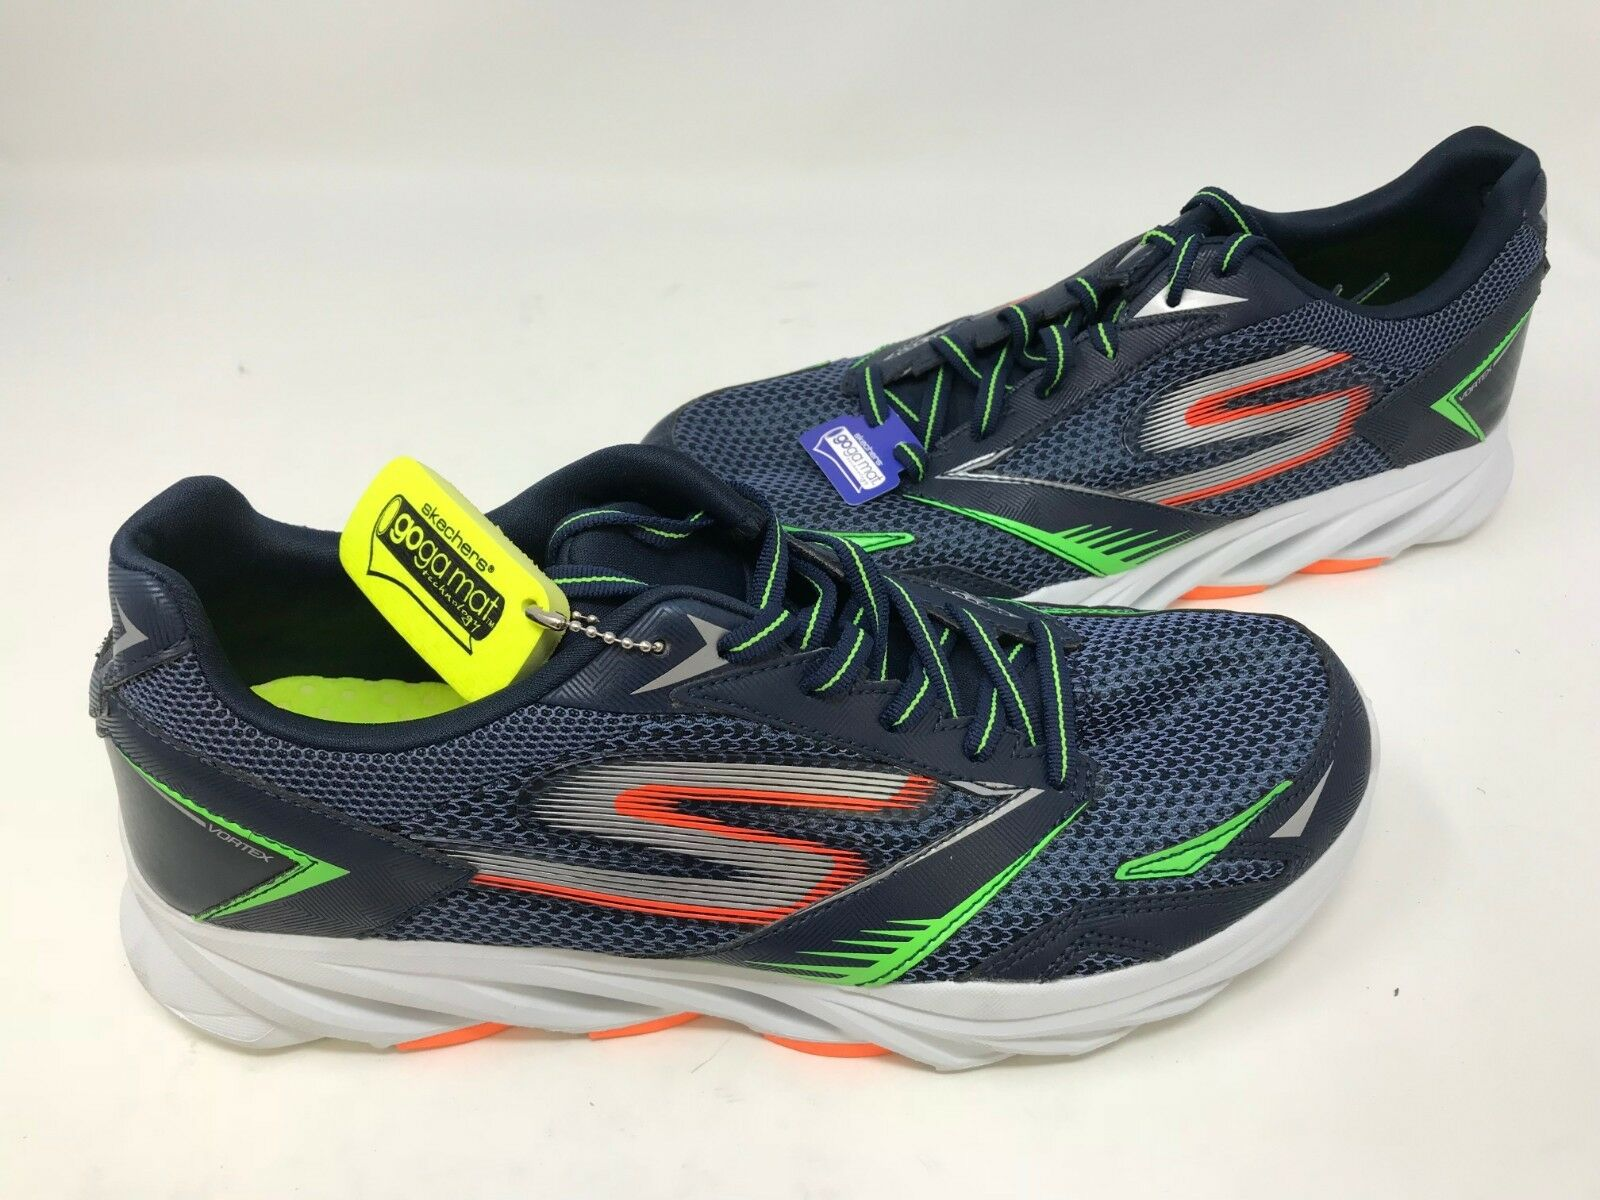 NEW! Skechers Men's GORUN VORTEX Shoes Navy/Orange T z Wild casual shoes